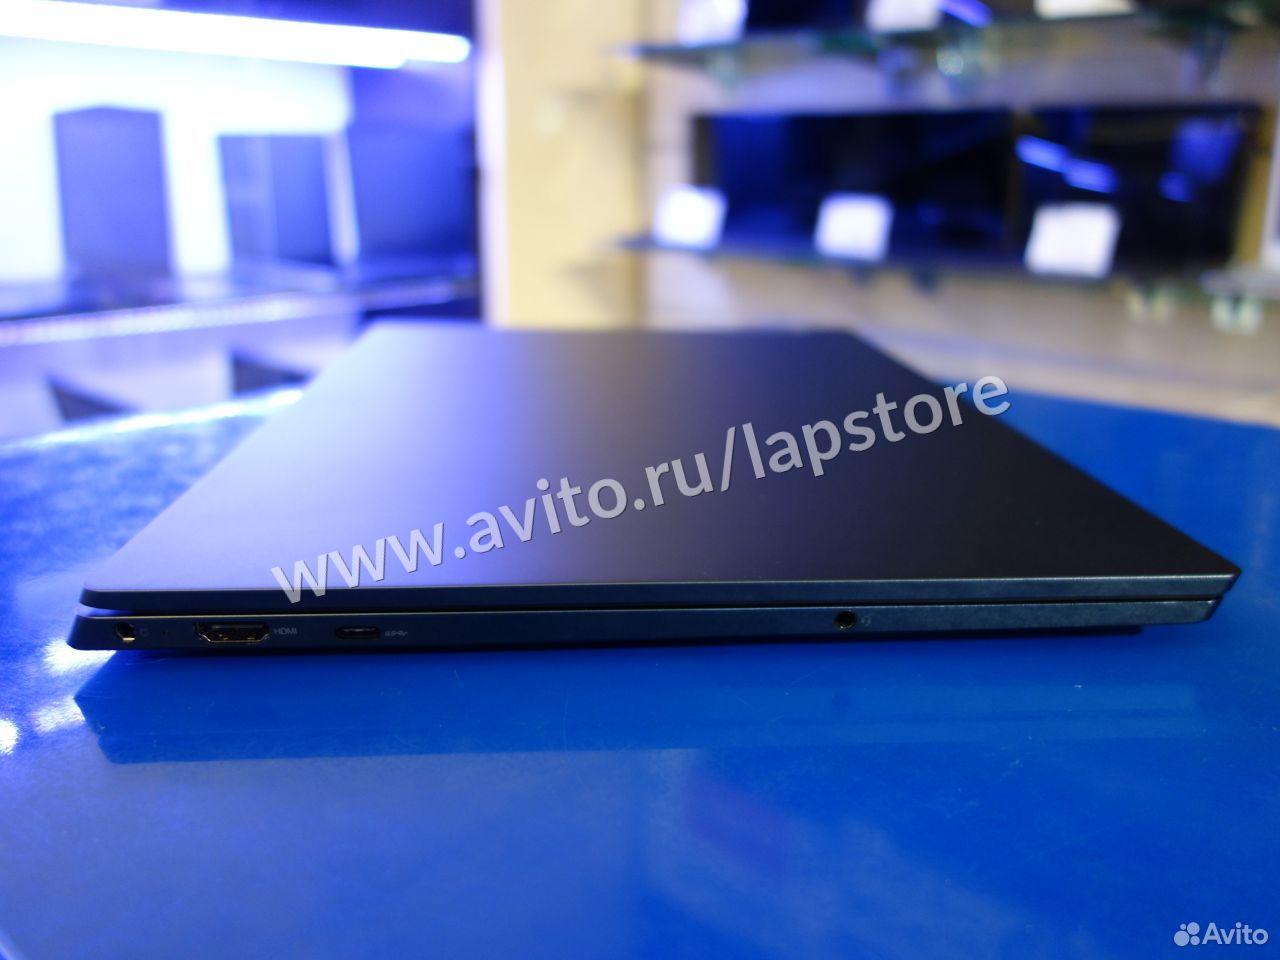 Ноутбук Lenovo S540 i5-10210/8G/512G SSD/MX250 2GB  84012422018 купить 7